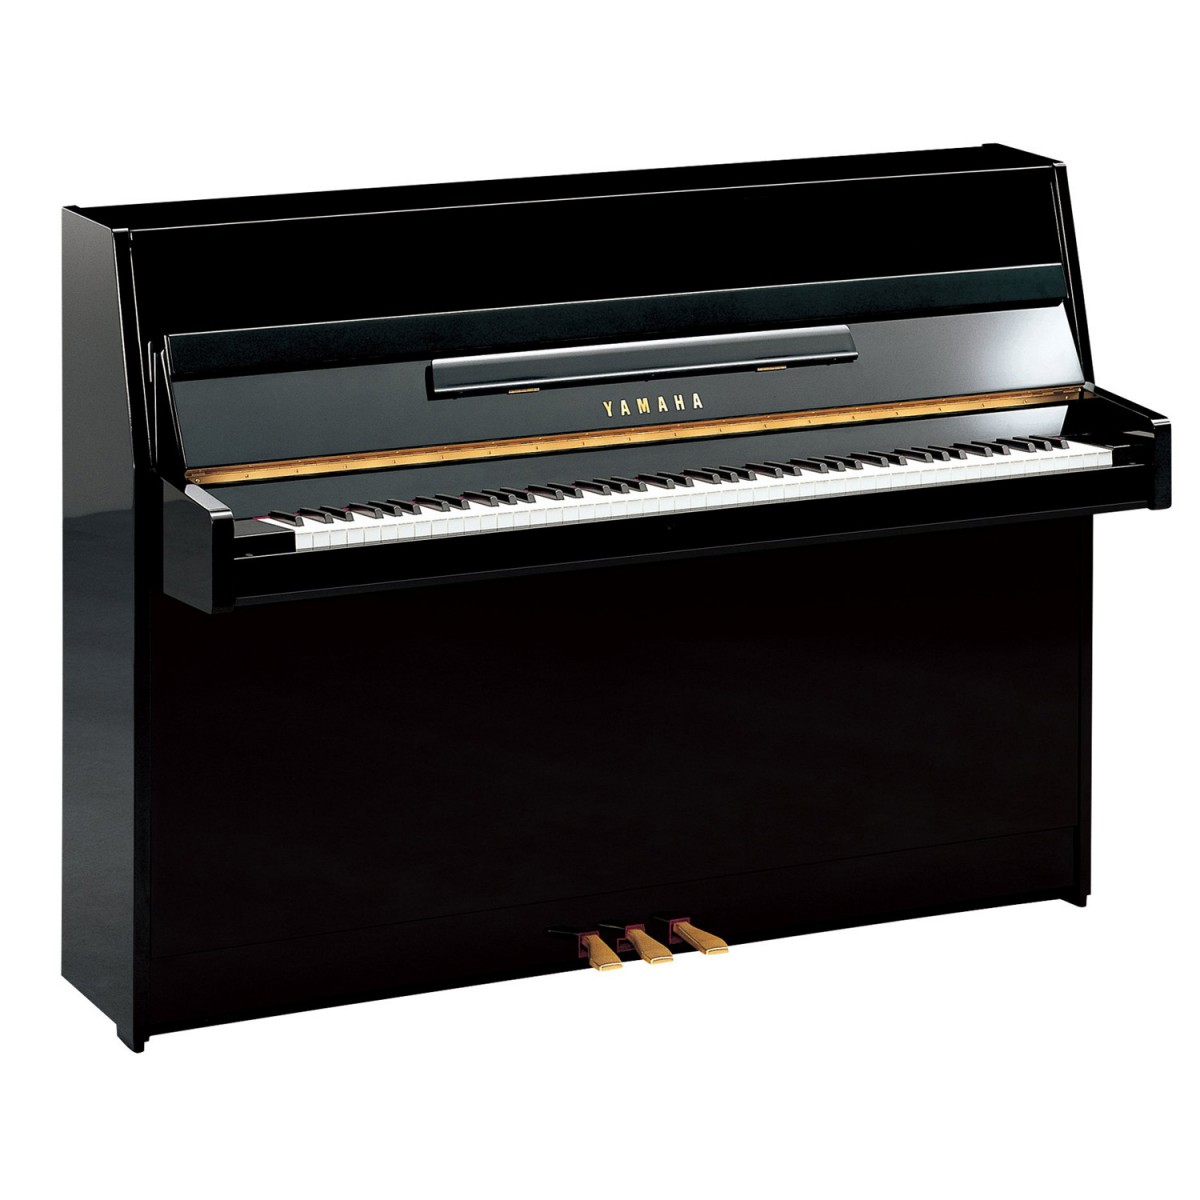 Yamaha B1 Klavier, schwarz